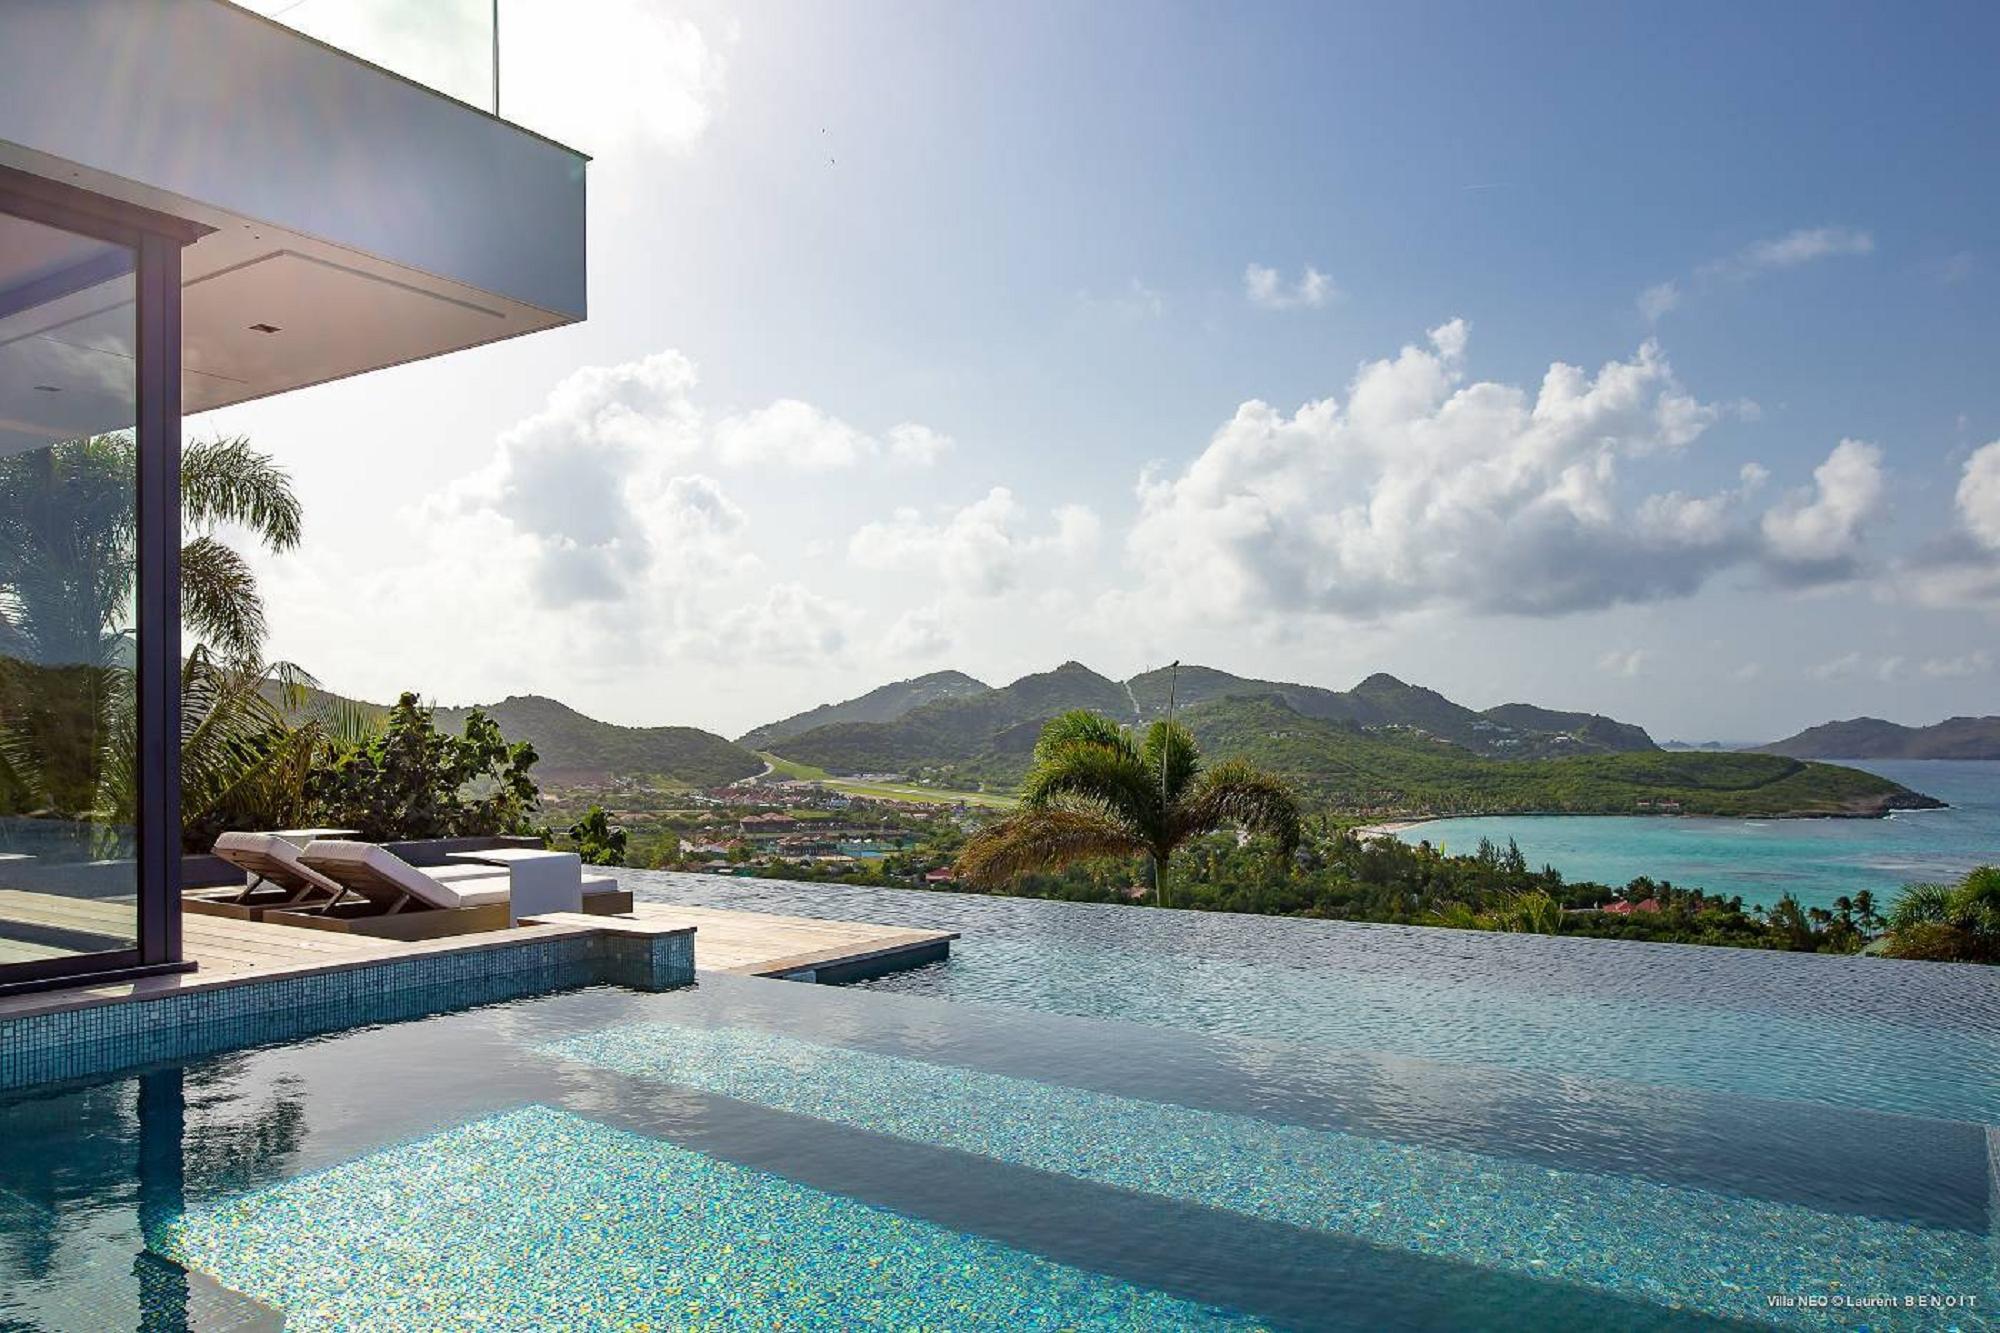 Villa Neo 6 BR - St Jean, St Barth / St Barts rental For Super Rich